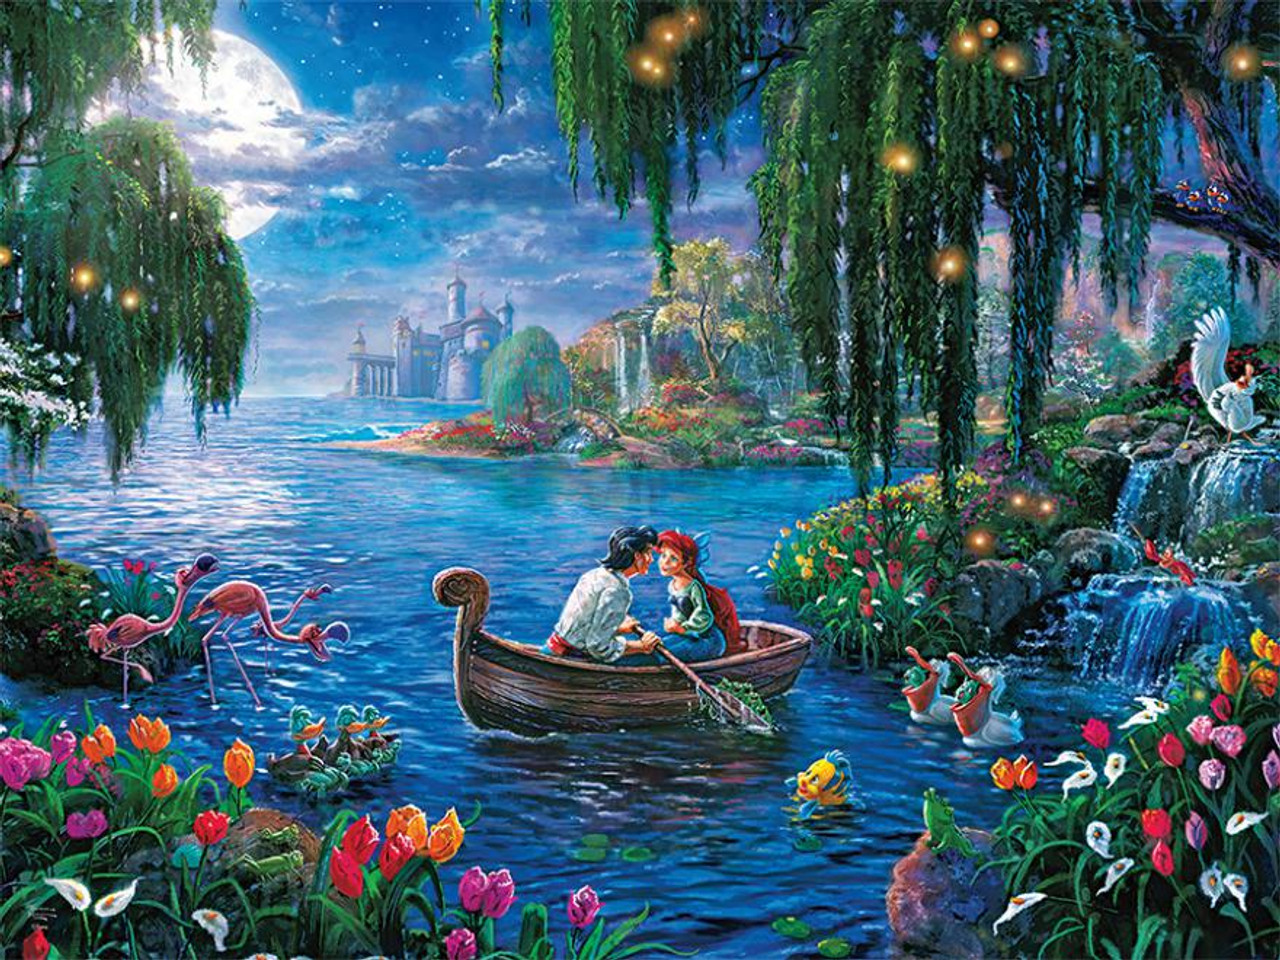 Thomas Kinkade Disney Princess Little Mermaid II 300pc